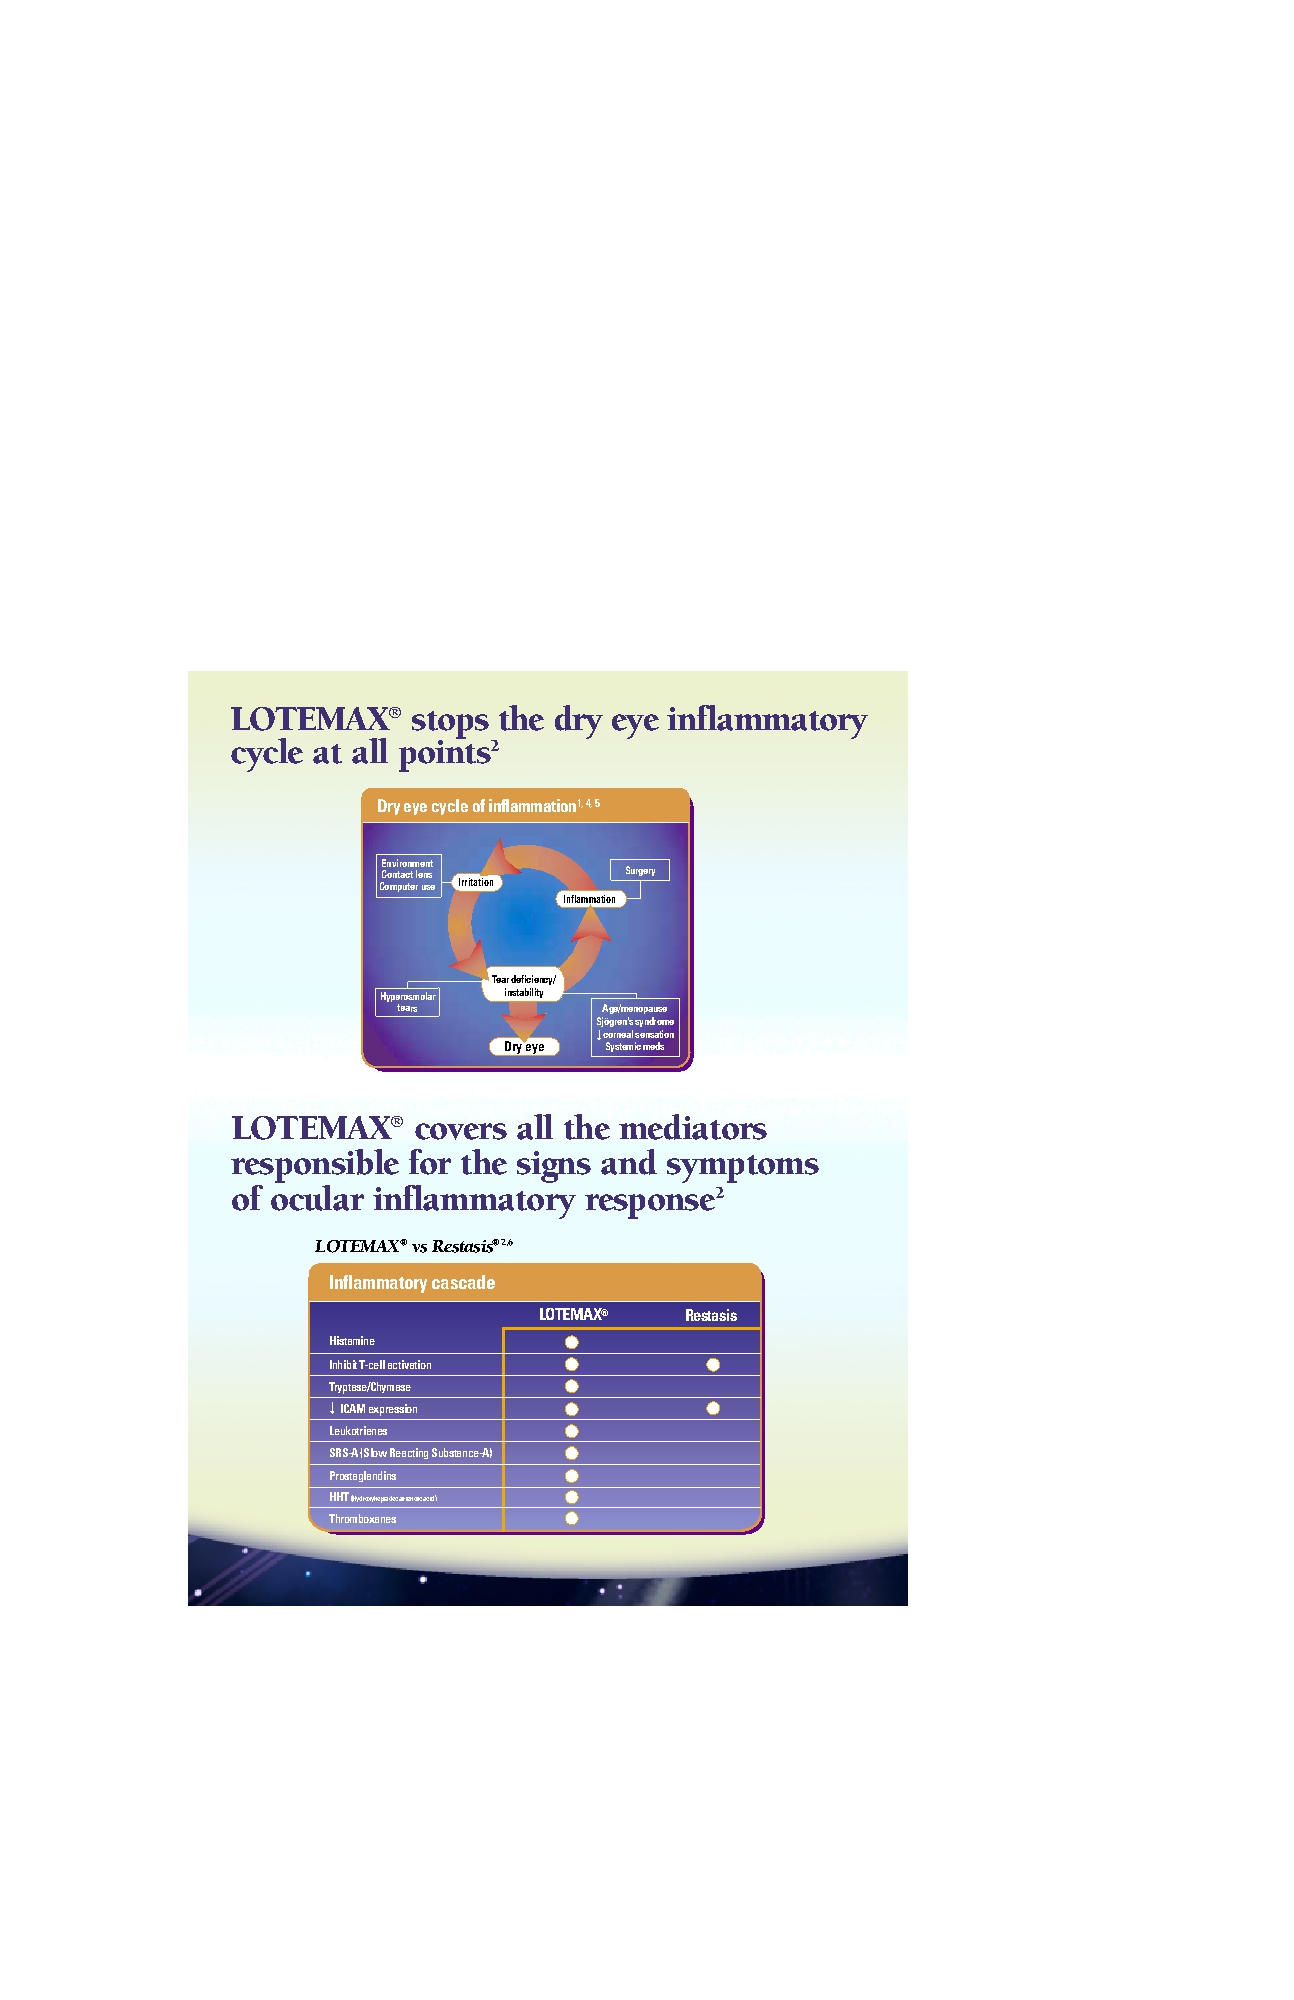 Pharma Promotion -